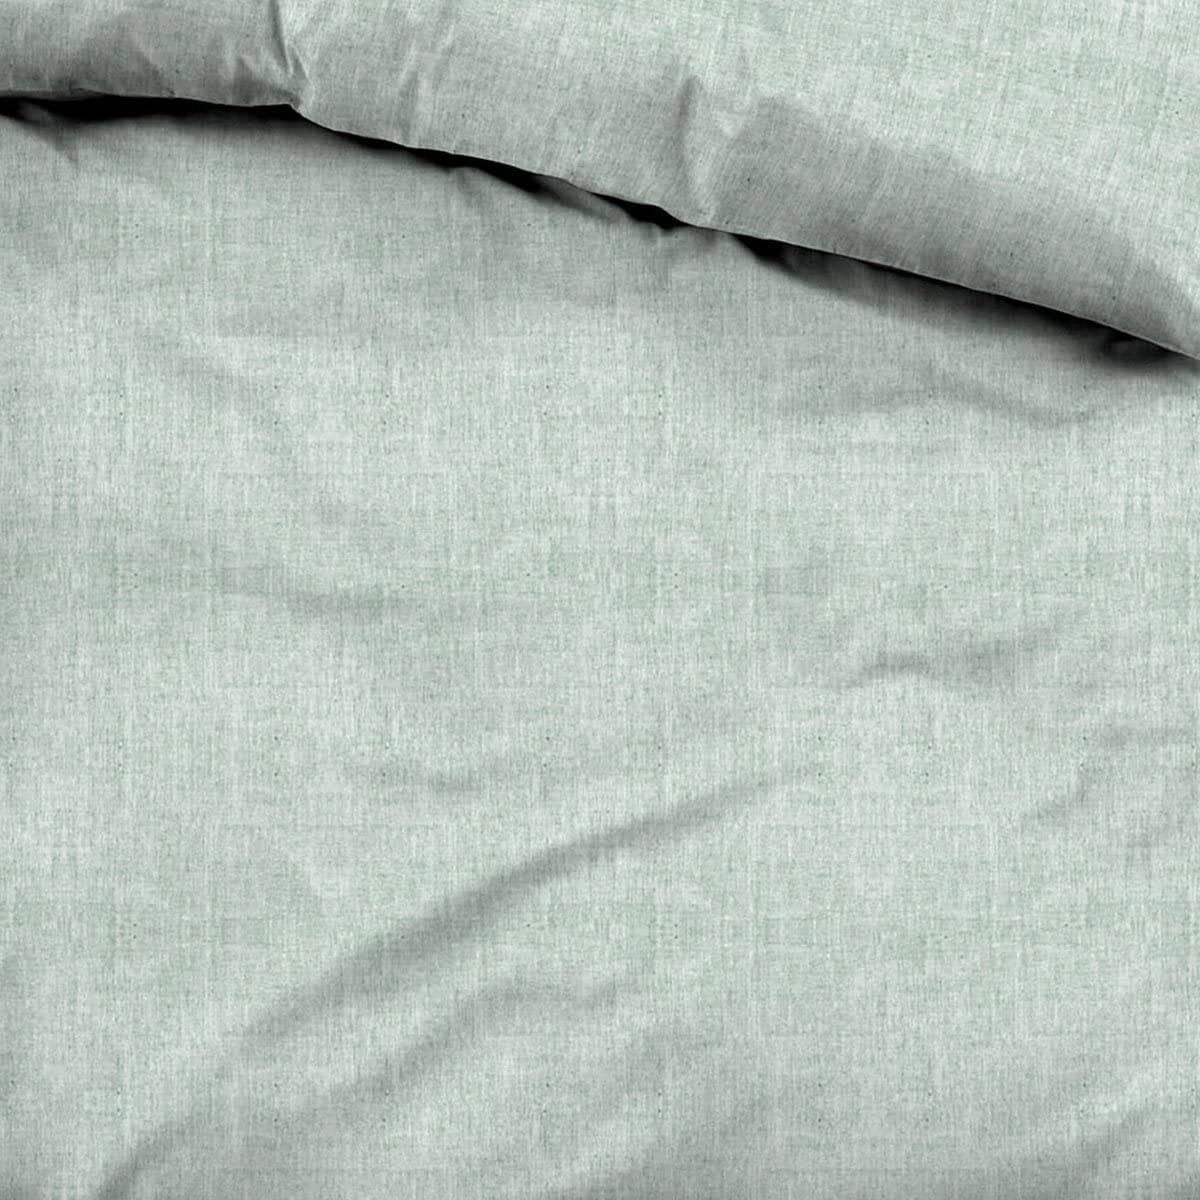 Bohemian Bettw/äsche-Set 100/% Baumwolle Baumwolle Super King 4-teilig USTIDE Home Textil Boho Style Bettbezug-Set Gold